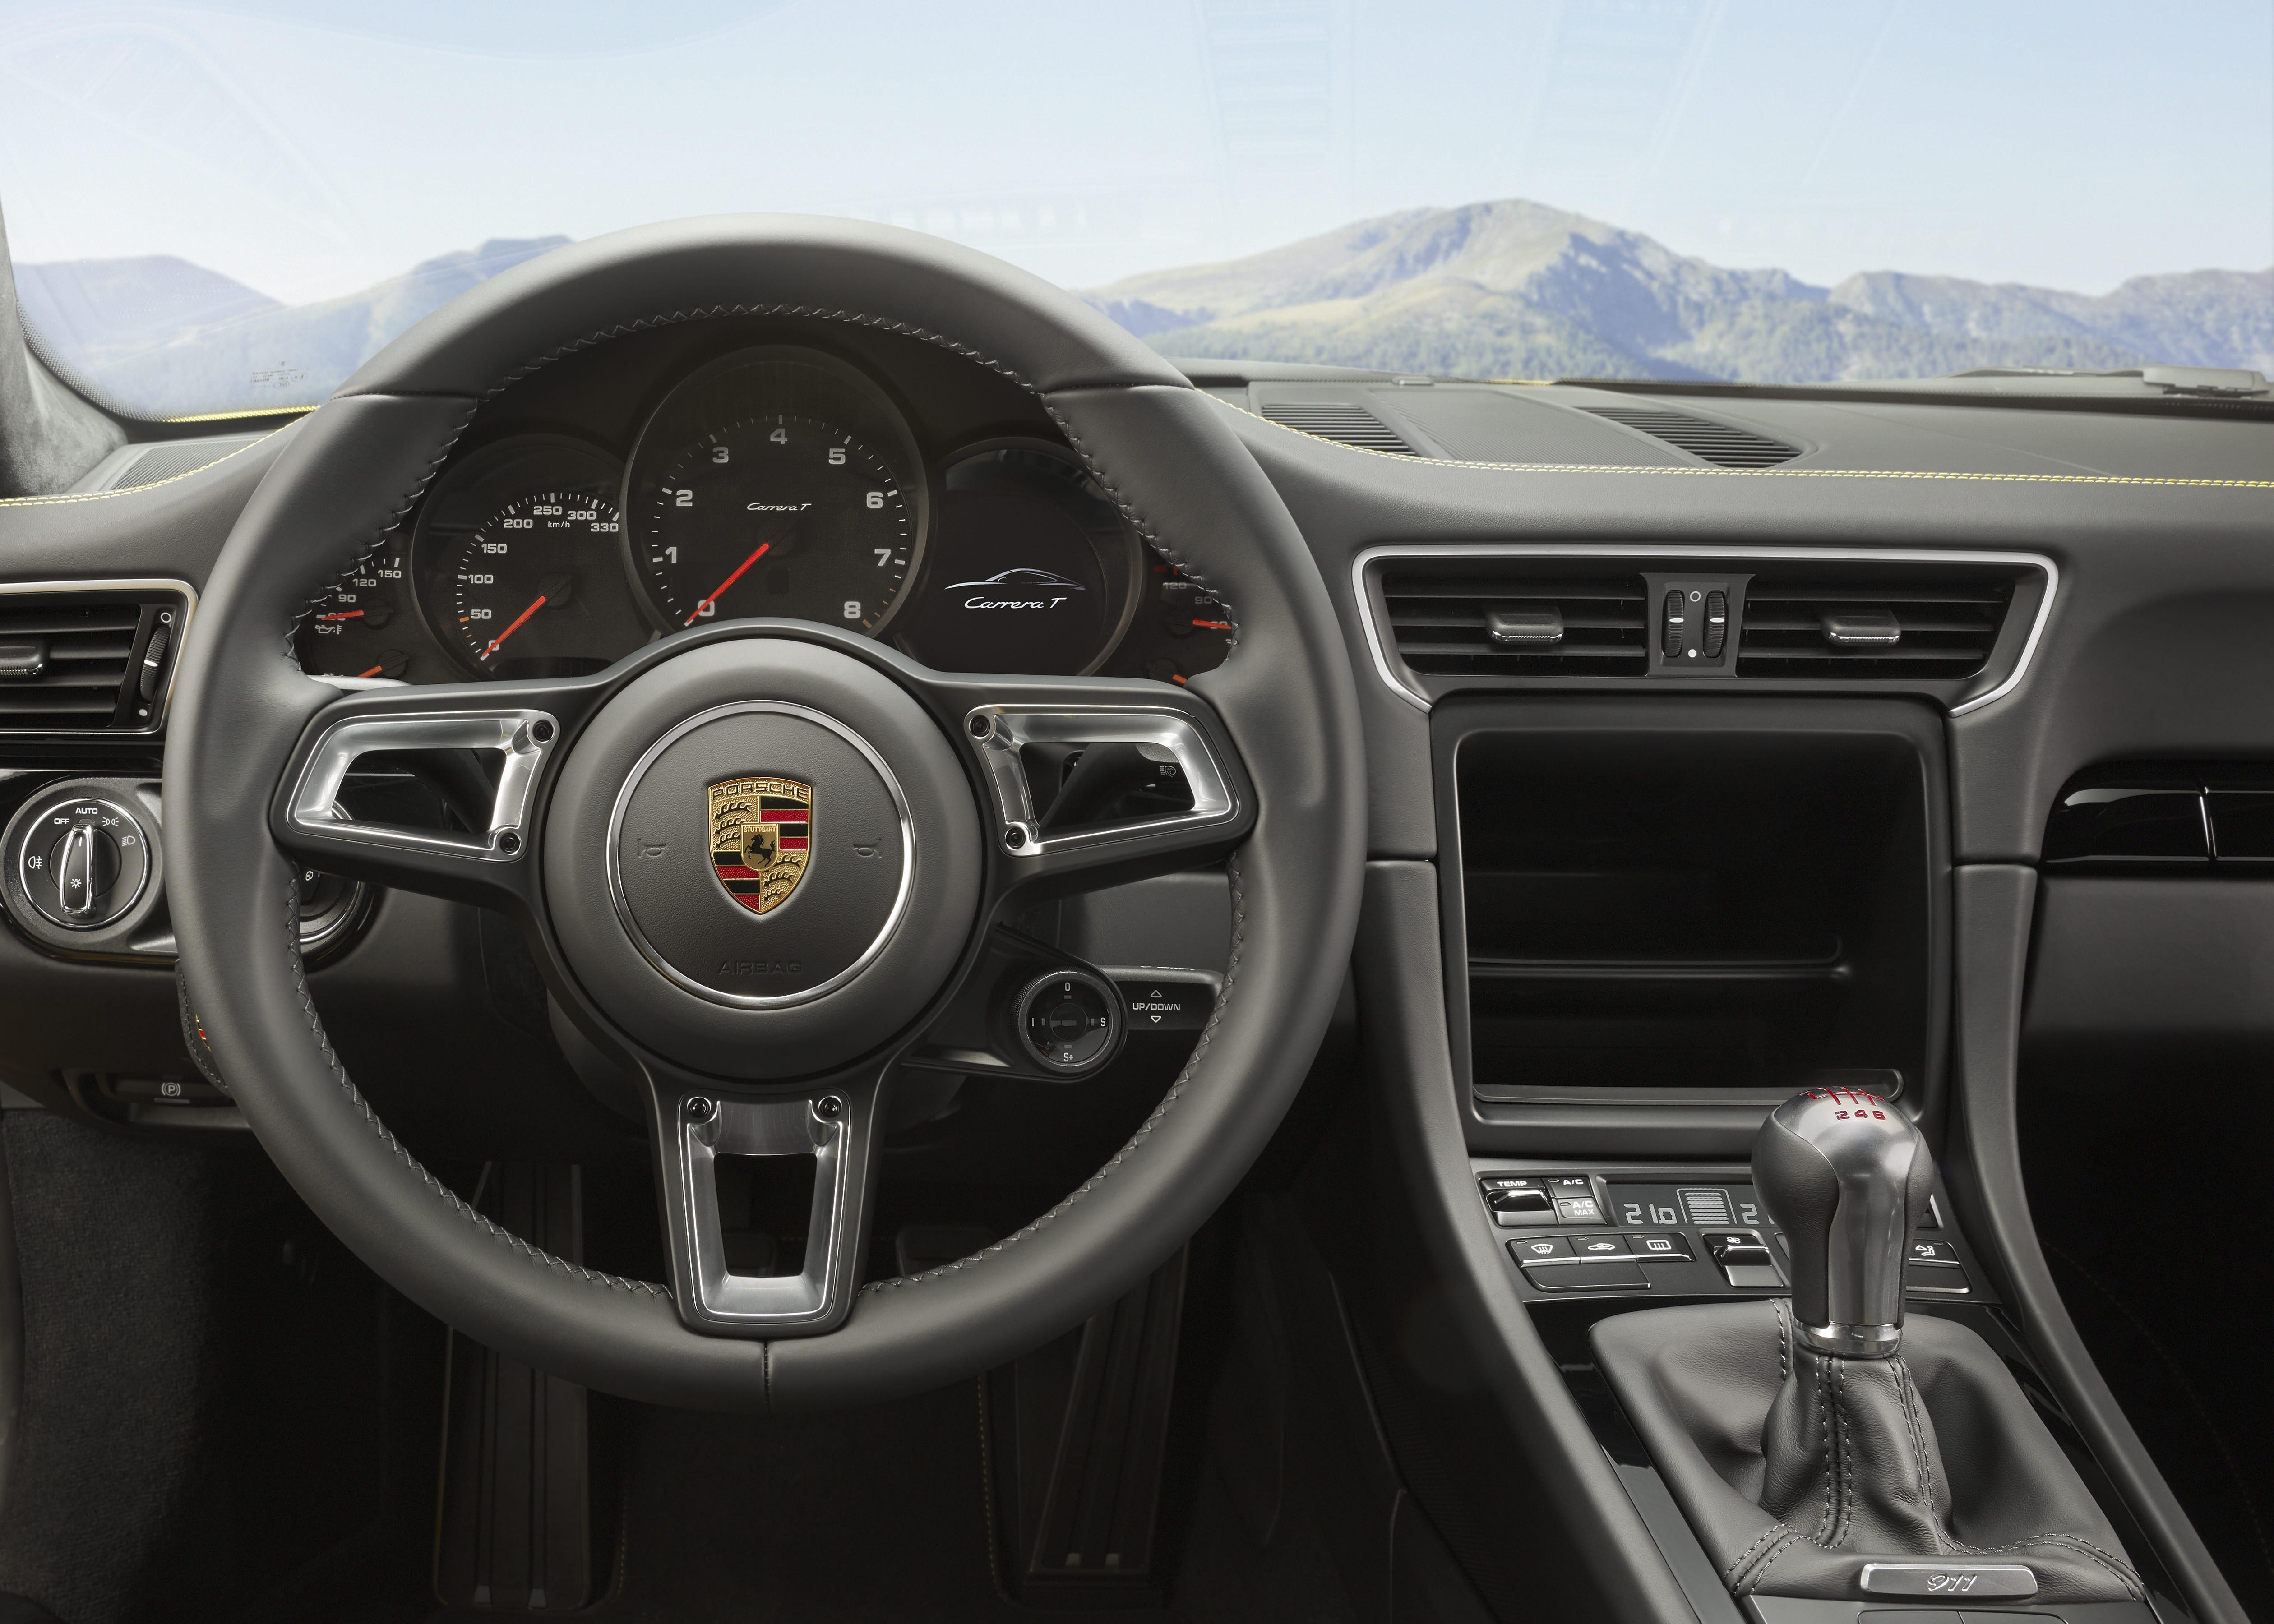 Porsche 911 Carrera T Direksiyon